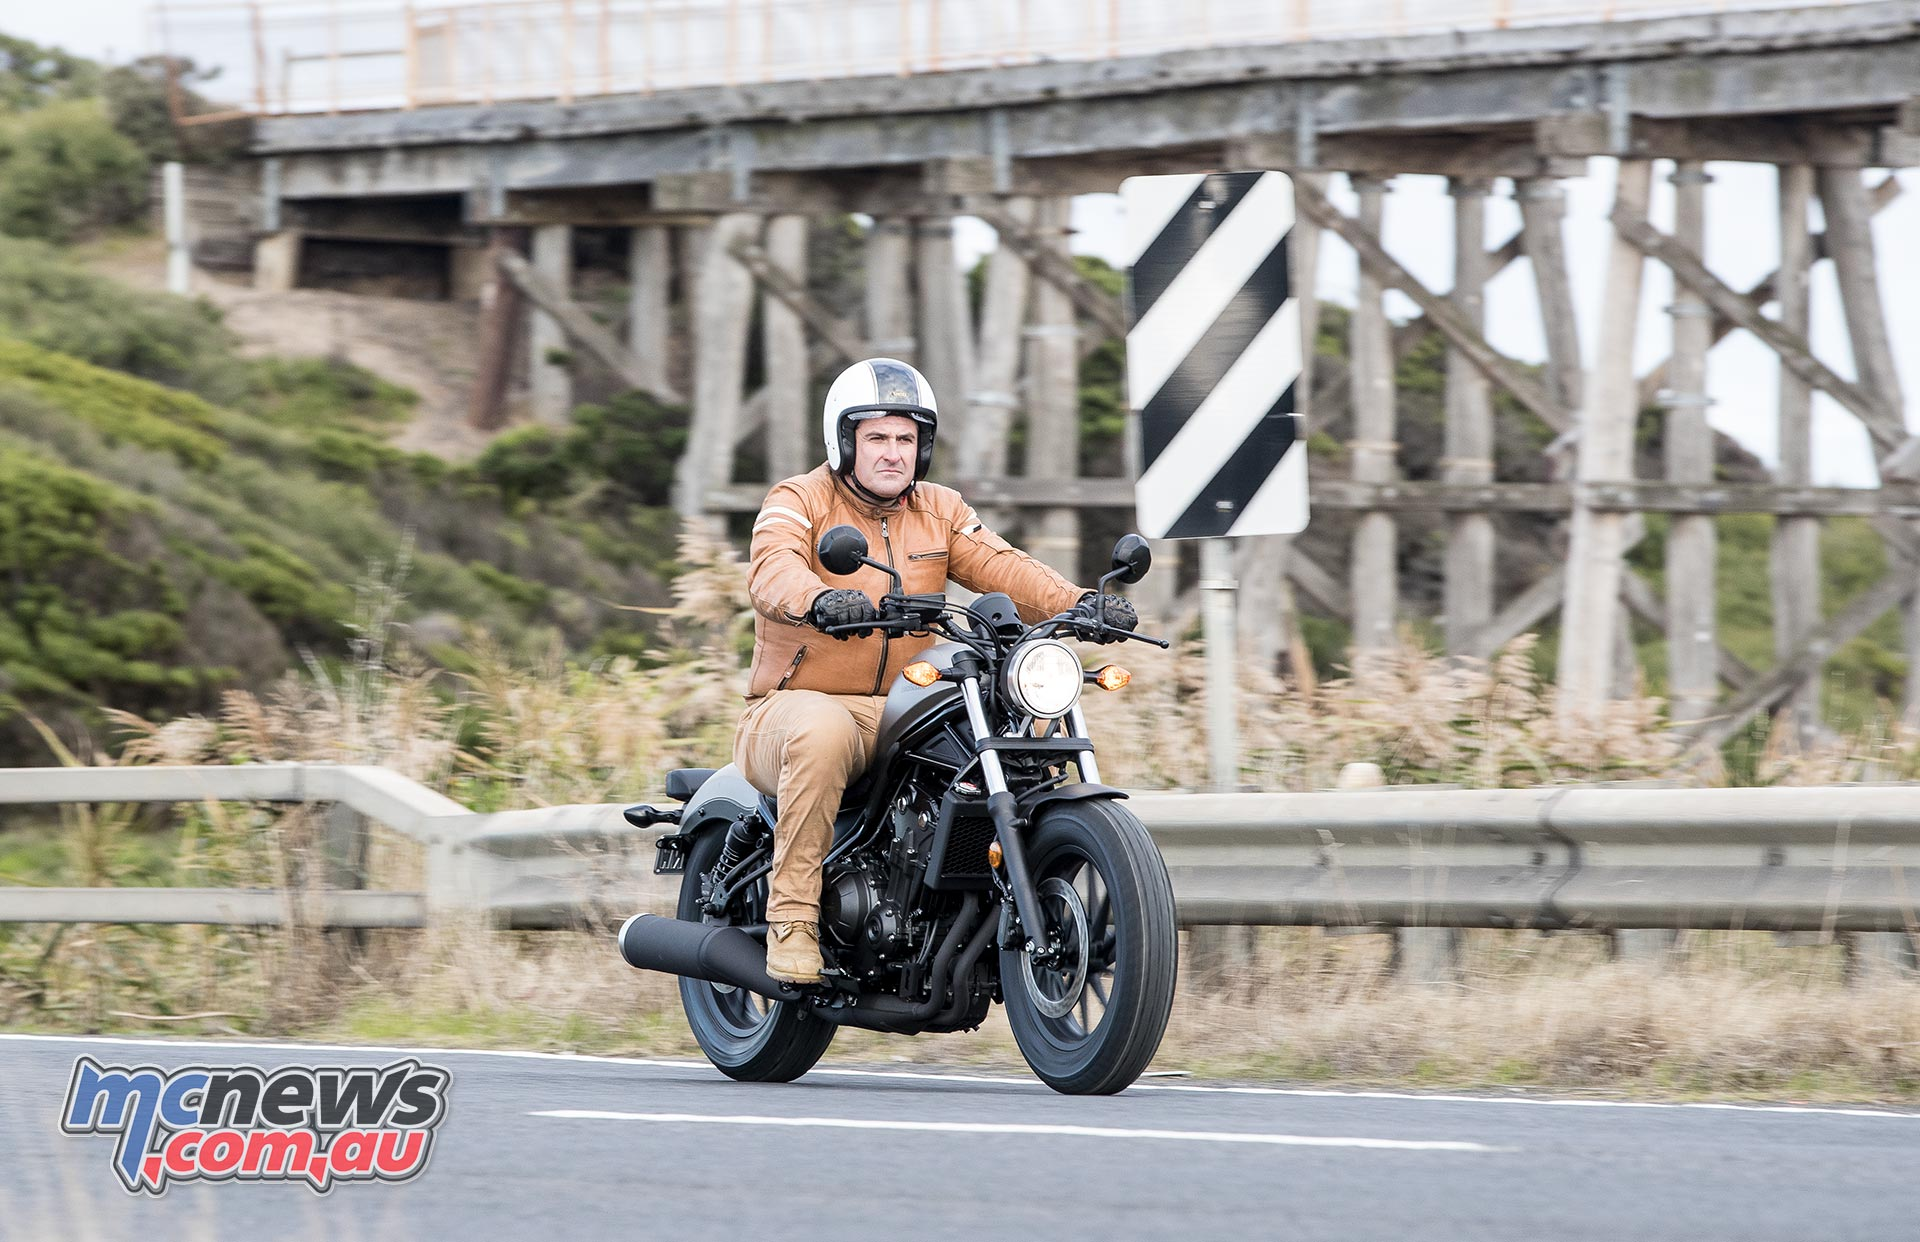 Honda CMX500 Quick Fang | Ten things about    | MCNews com au